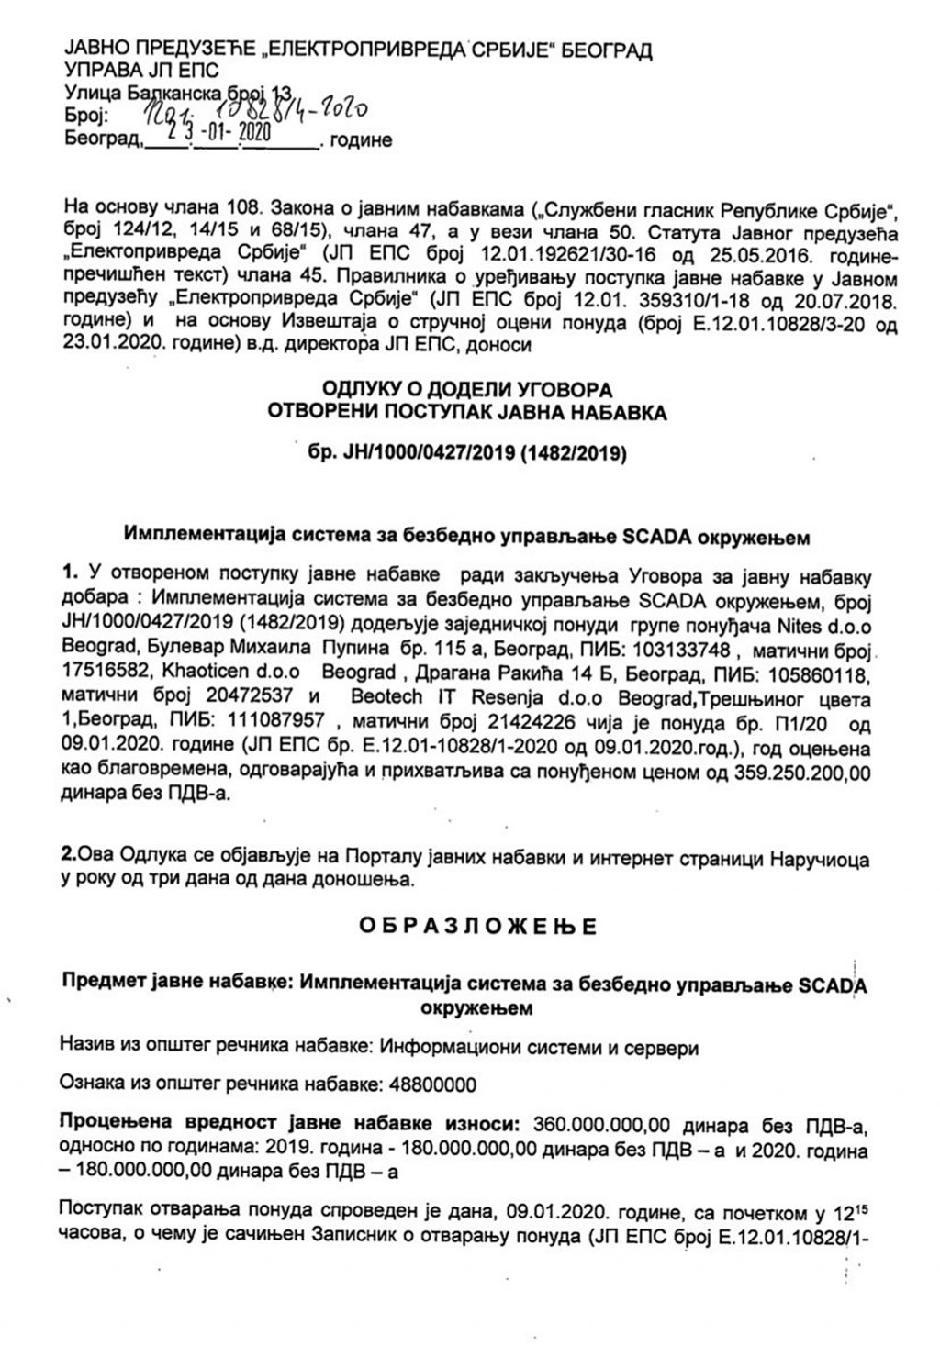 Ugovor između EPS-a i firme Nites FOTO: EPS